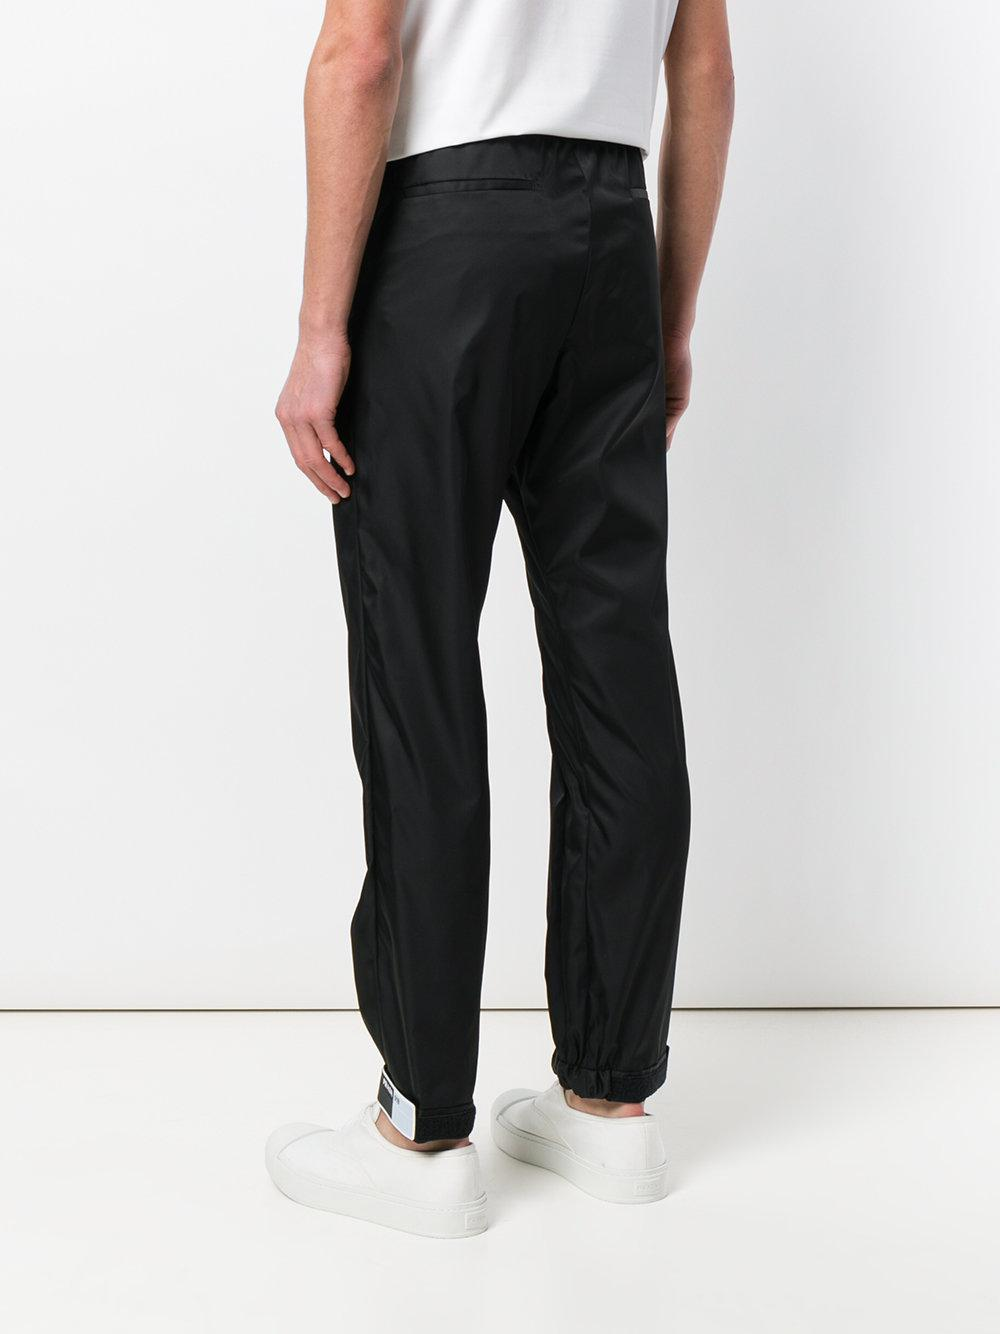 0c38b314 Men's Black Brand Patch Track Pants